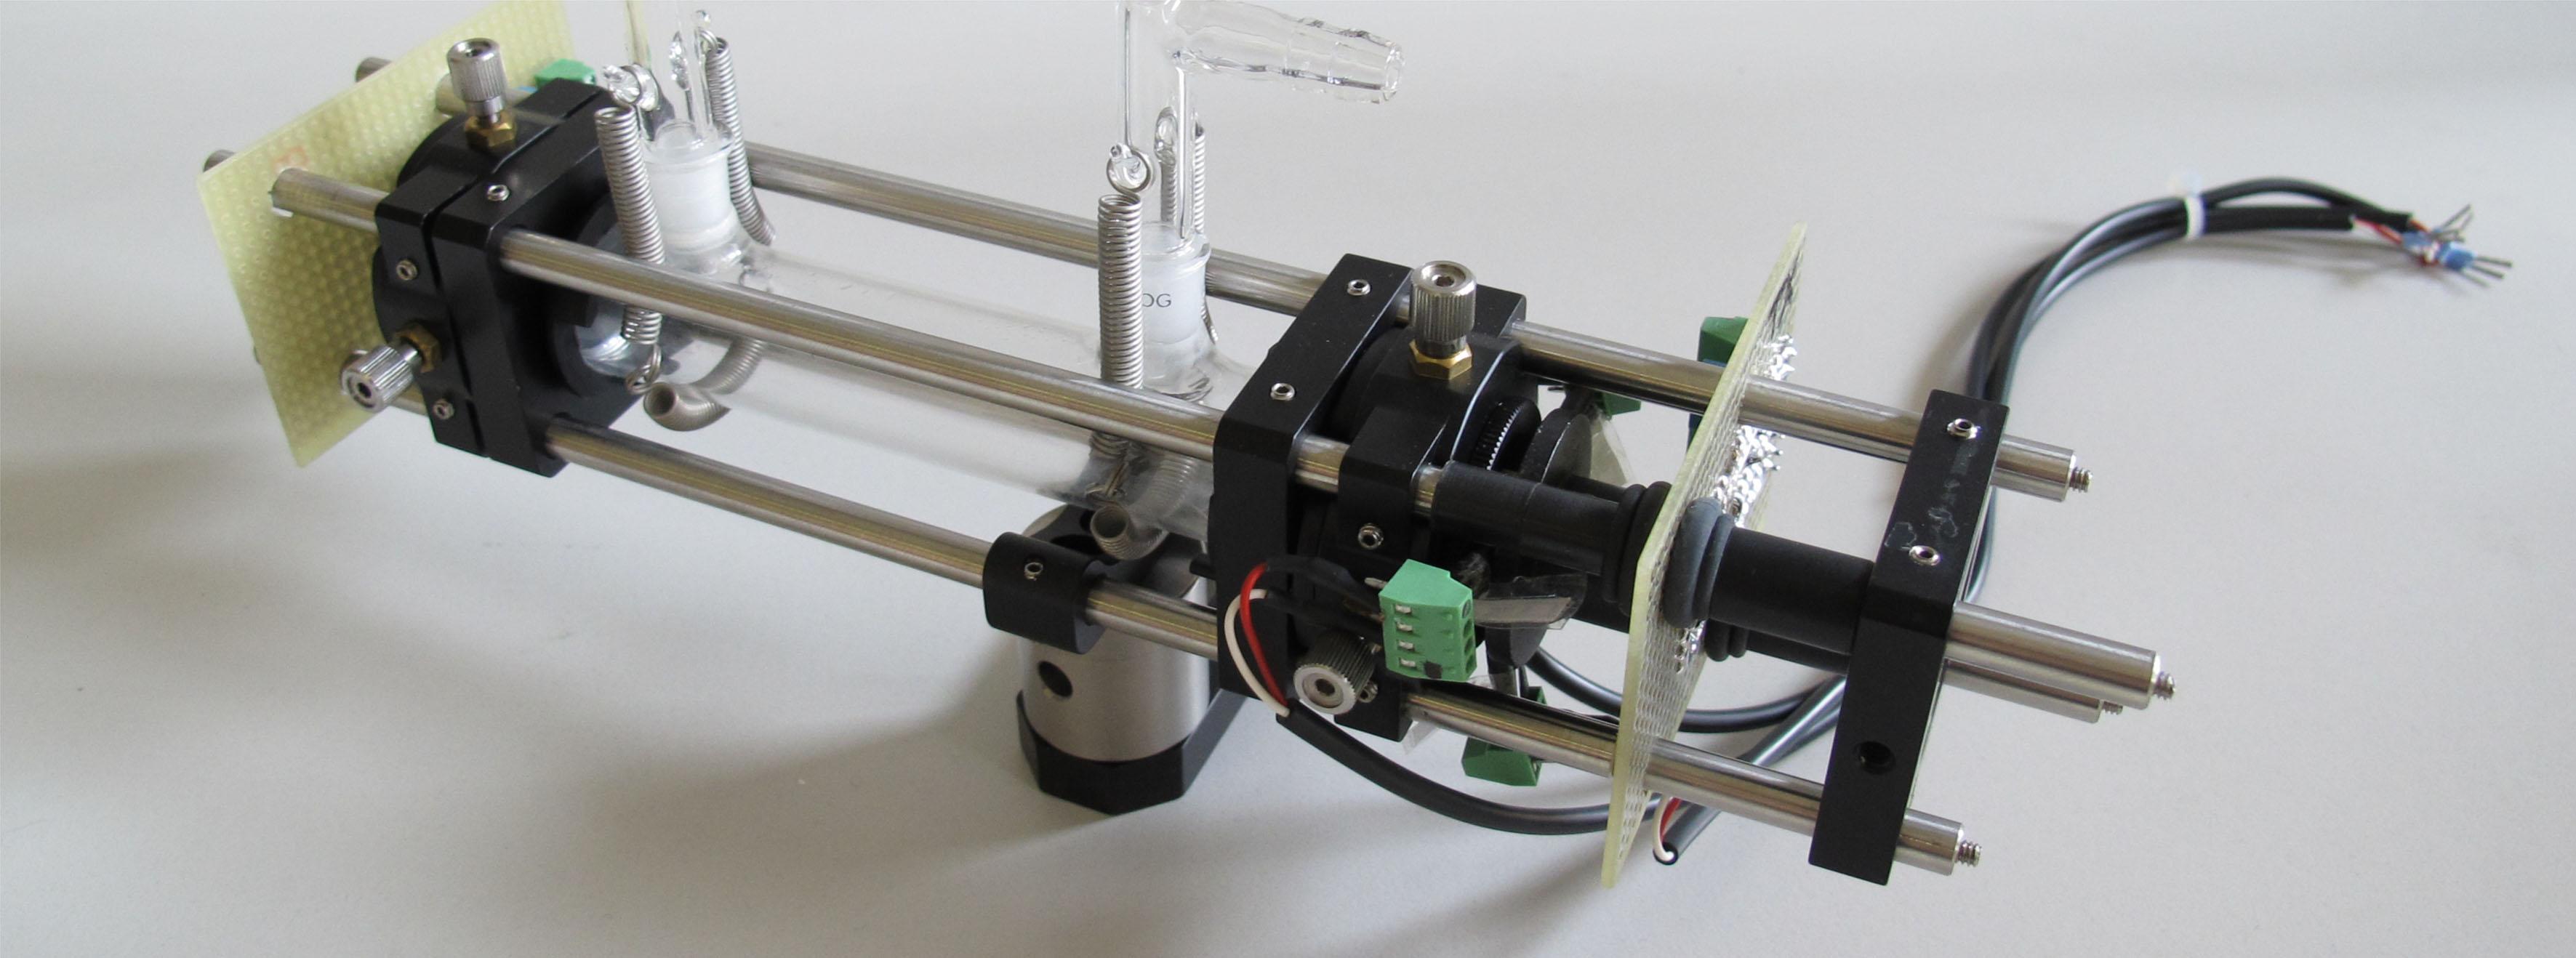 Measurements, Instrumentation and, Sensors Group